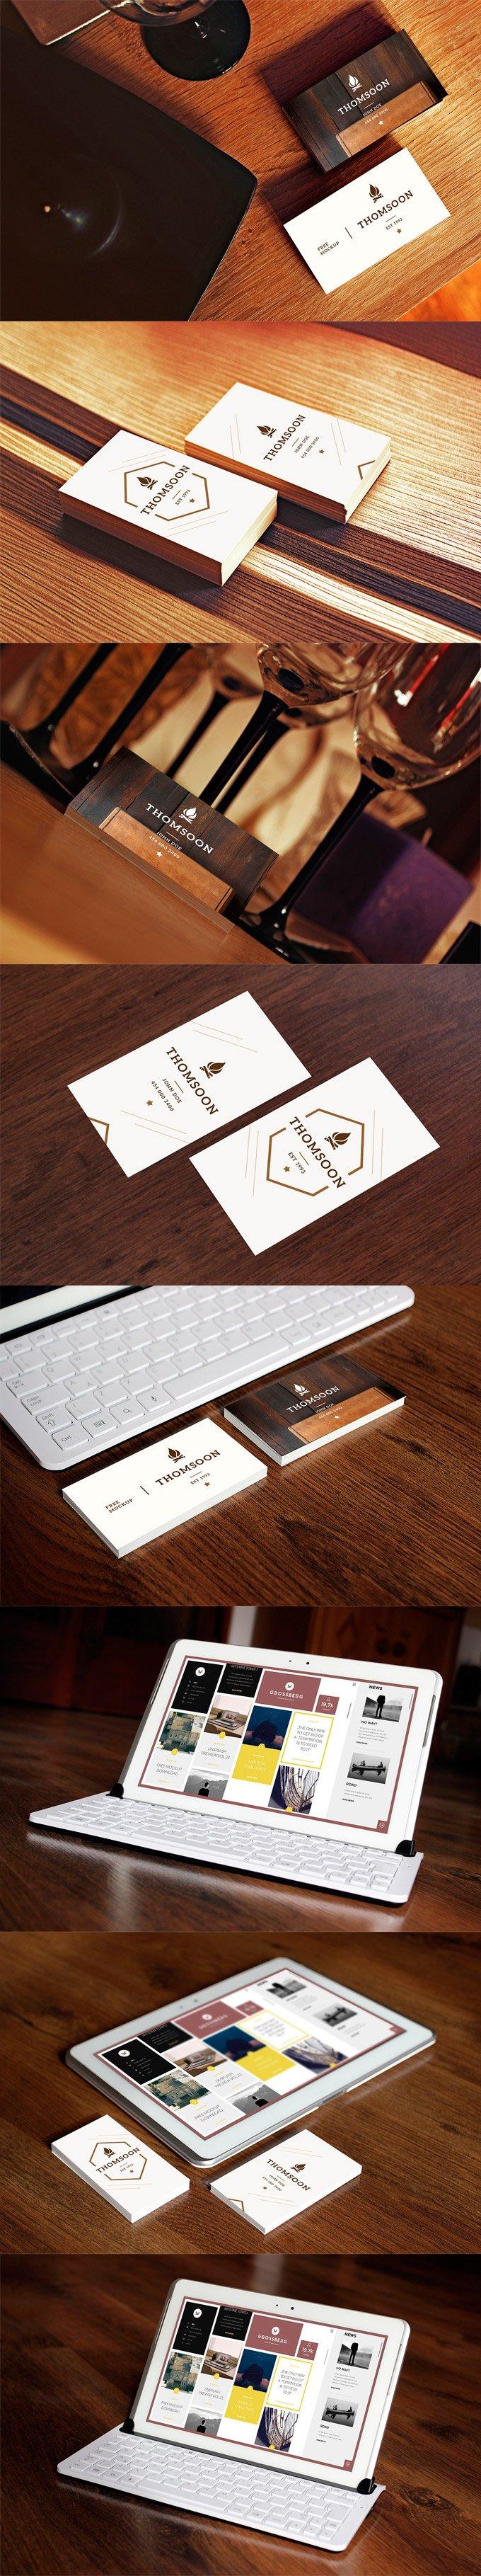 9+ Business Card Mockup (.Psd) скачать бесплатно